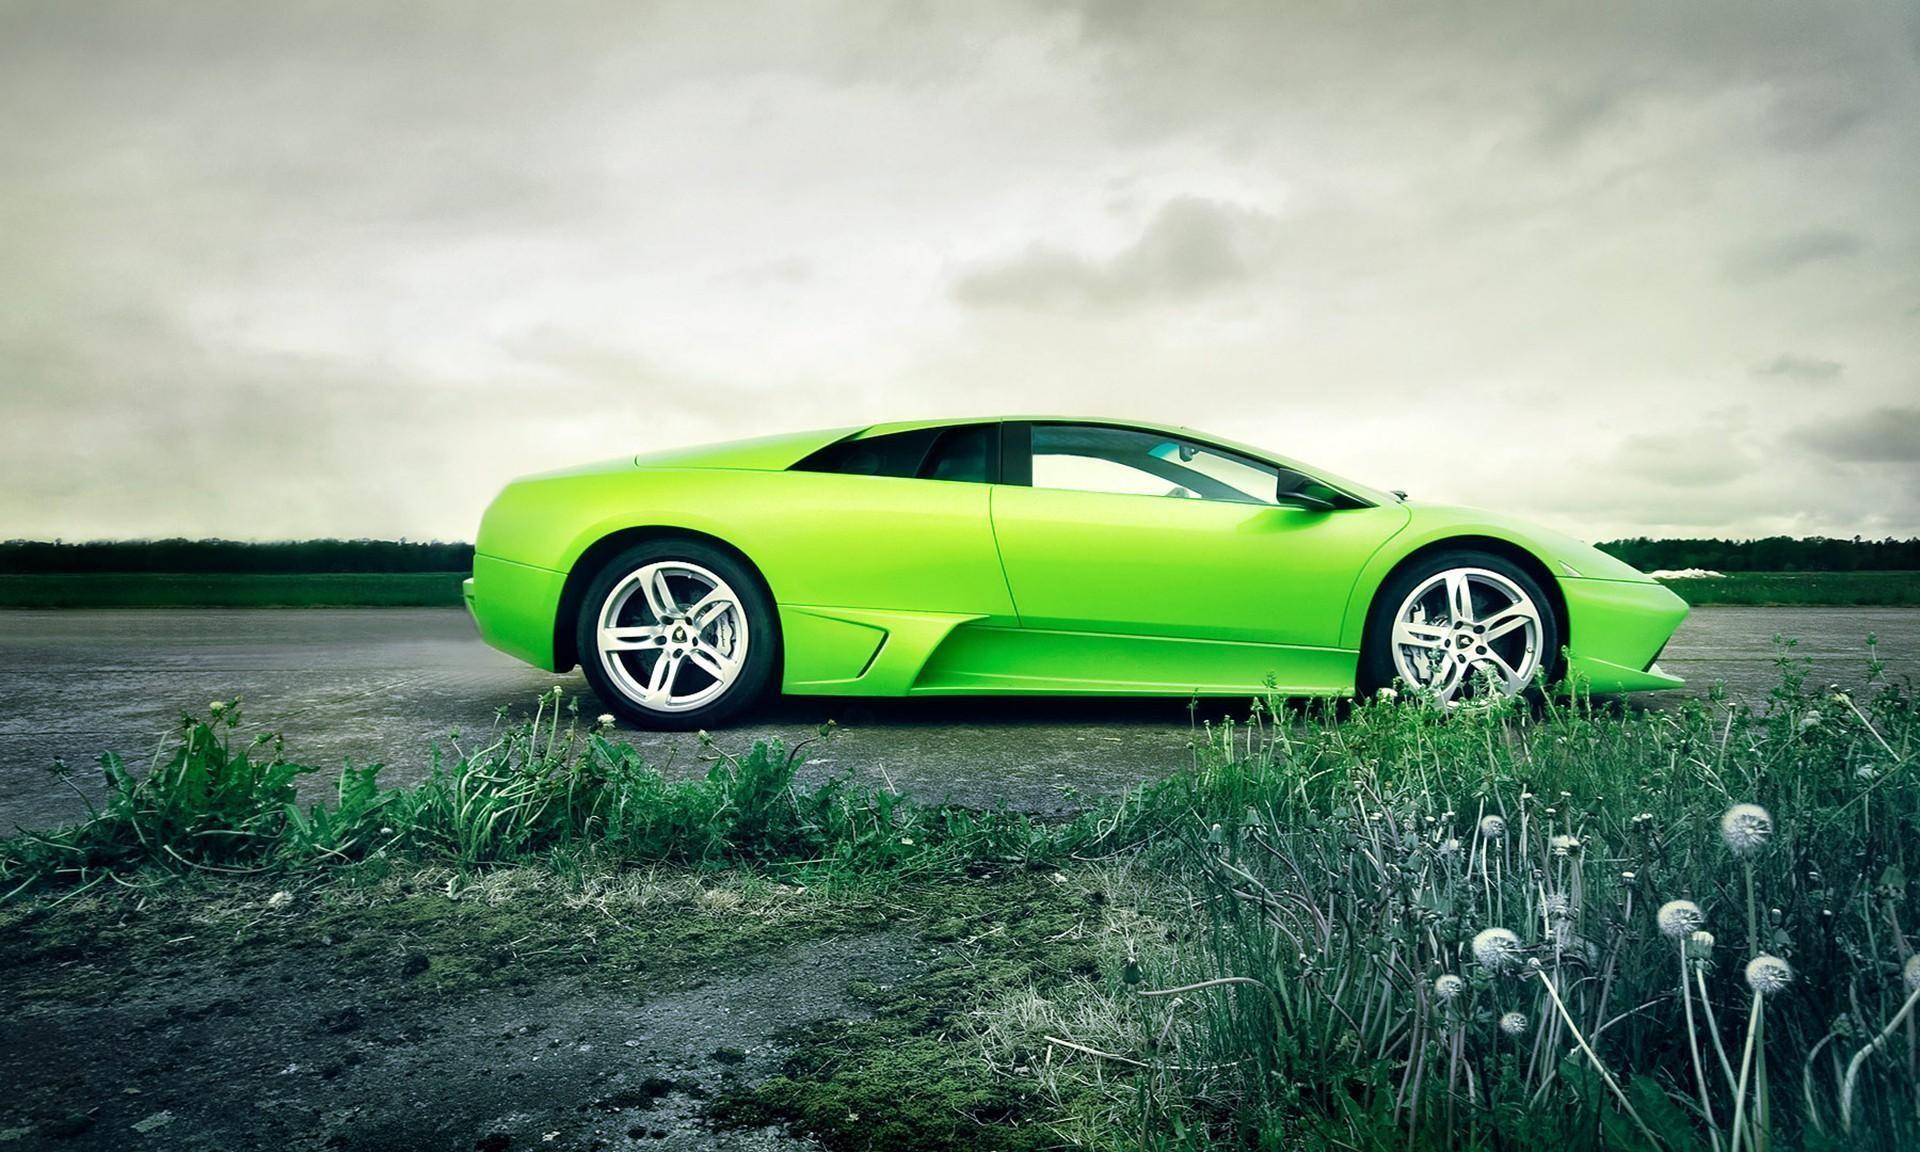 Cool Green Car